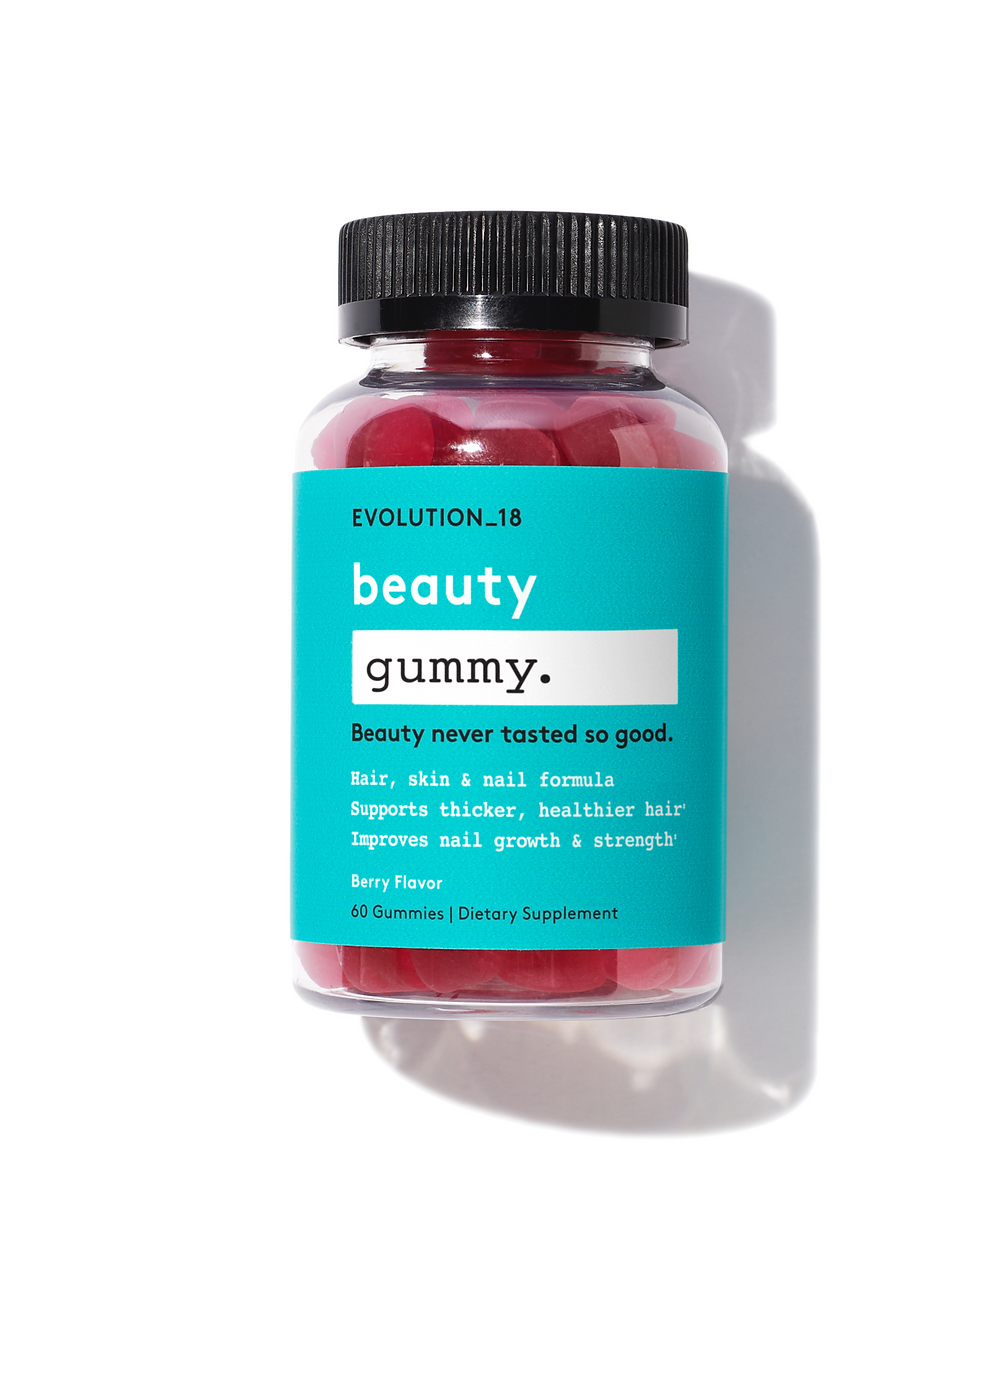 Evolution_18 Beauty Gummy